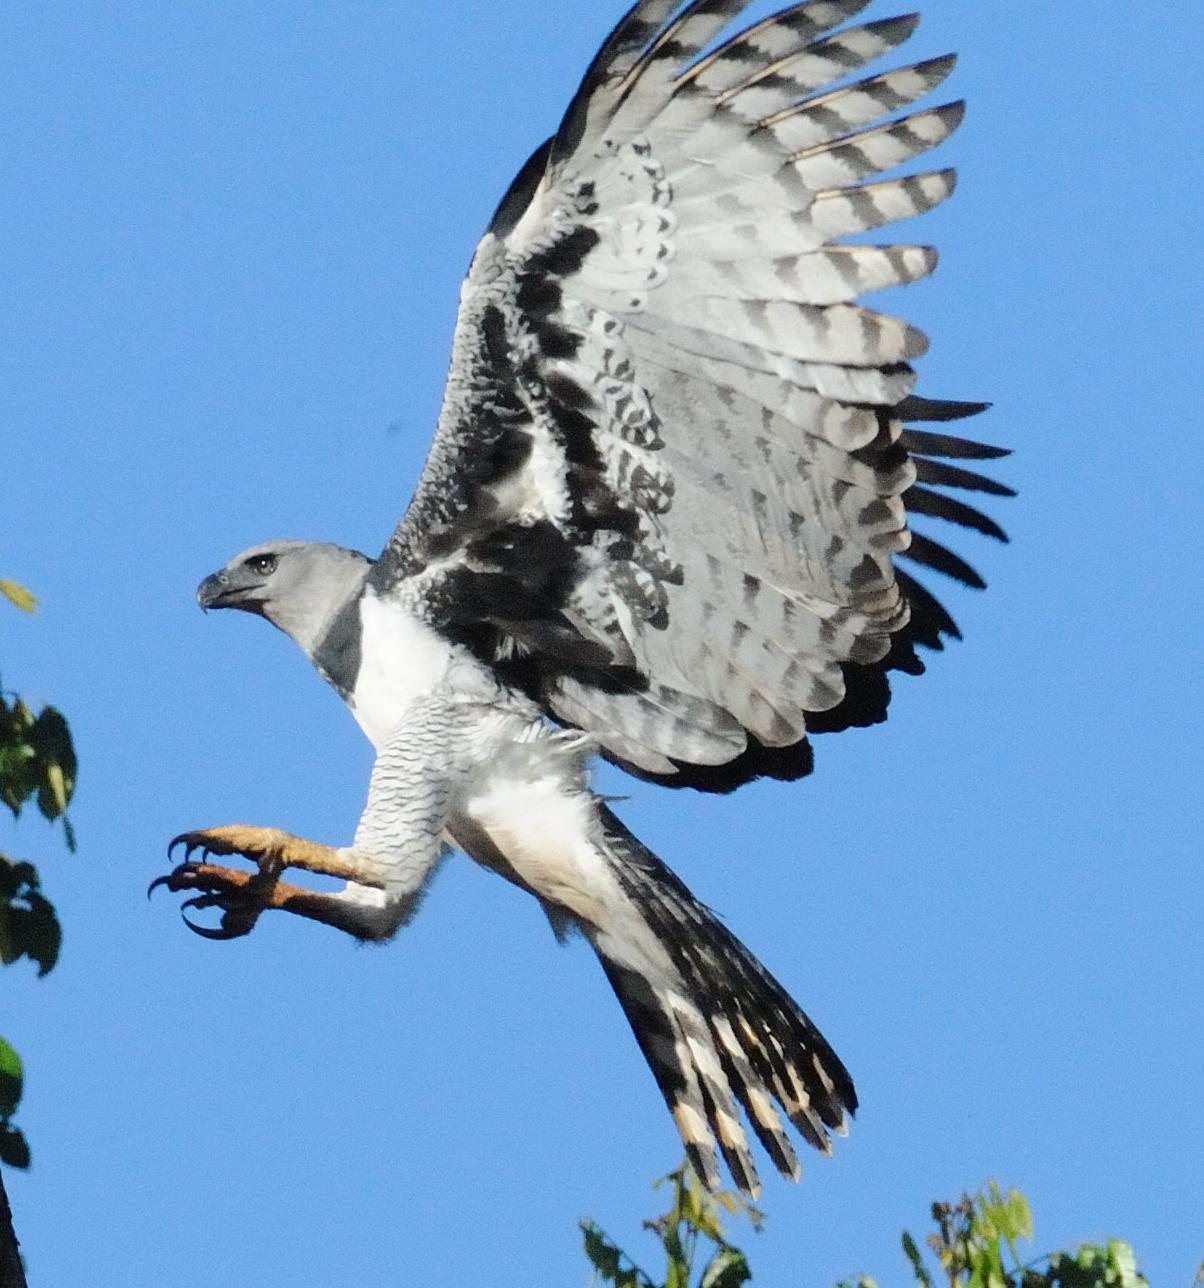 Animal Kingdom: Harpy Eagle